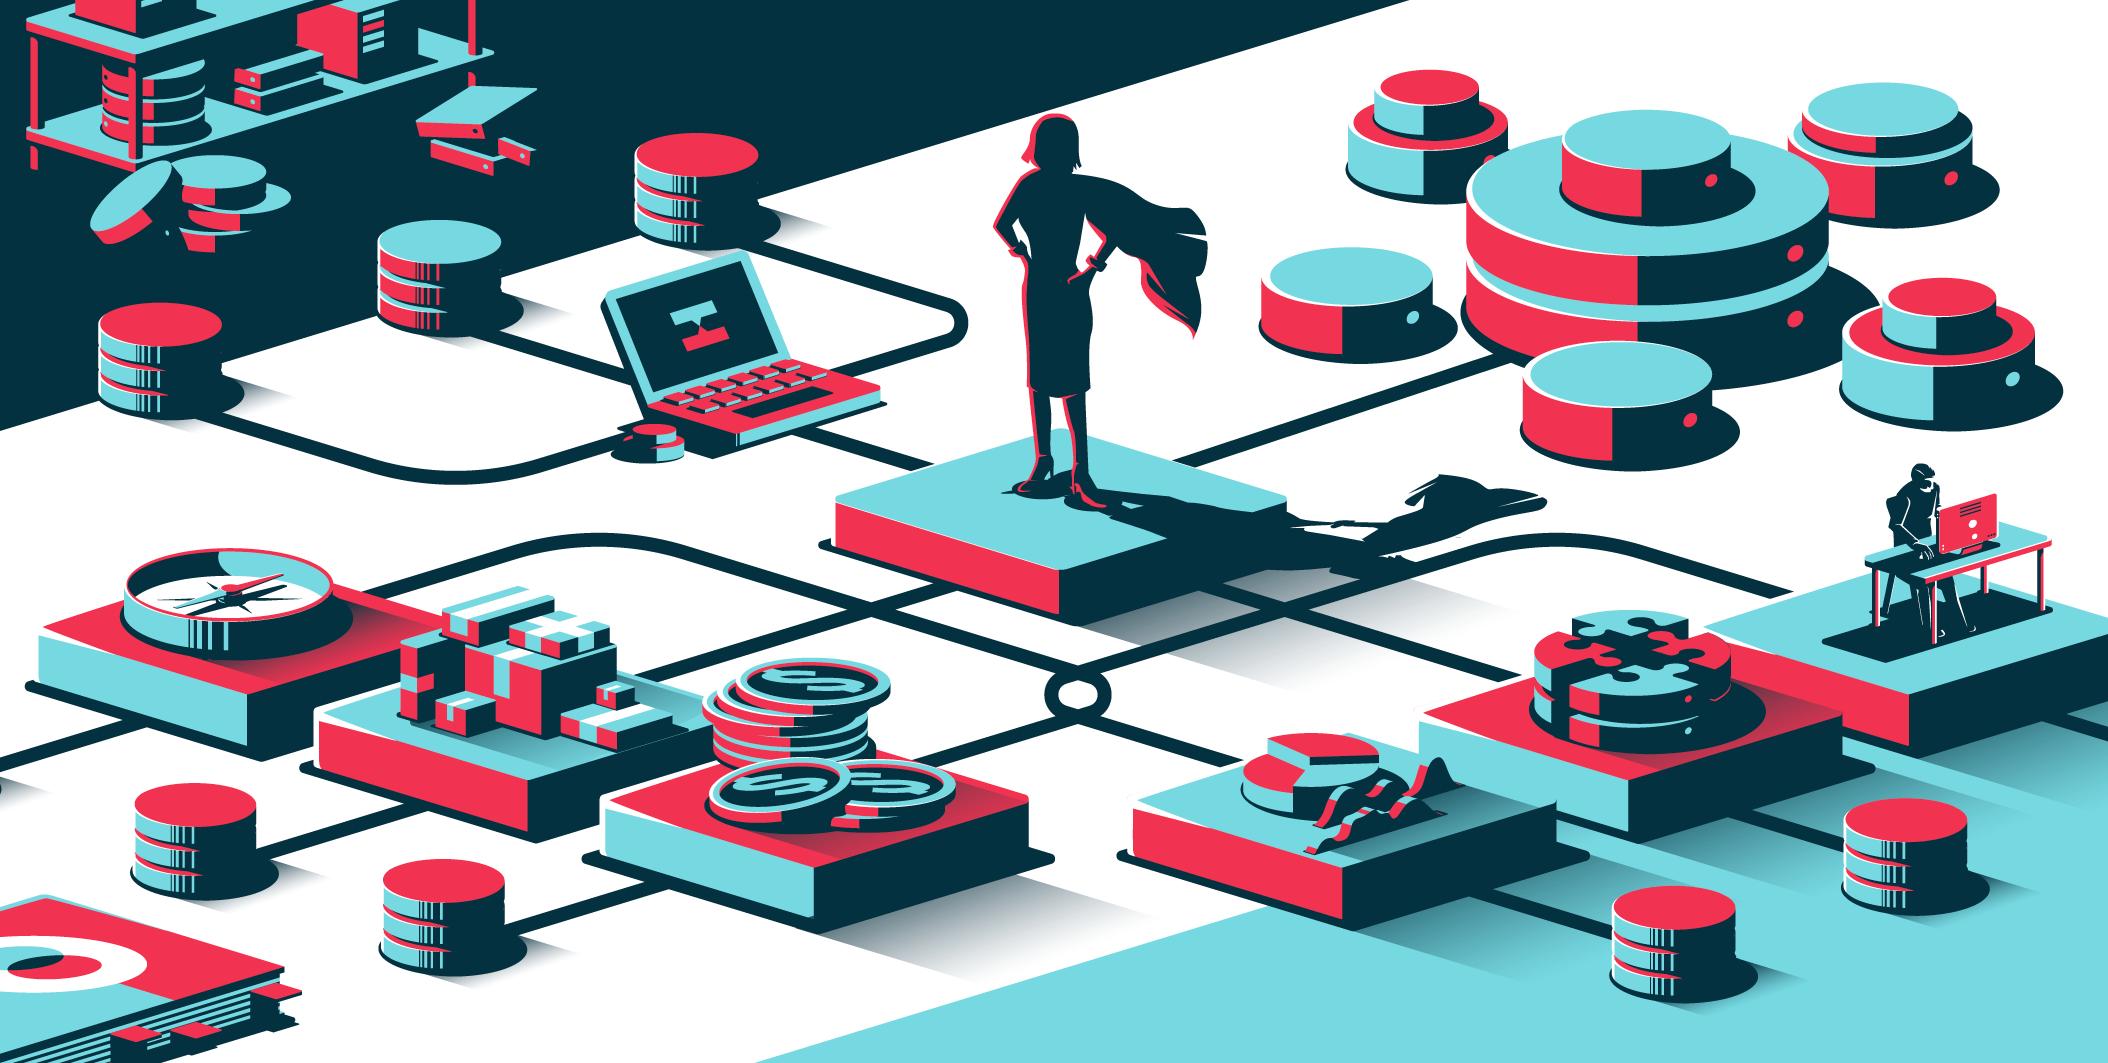 tech-ecosystem-maturity-co-selling-crossbeam